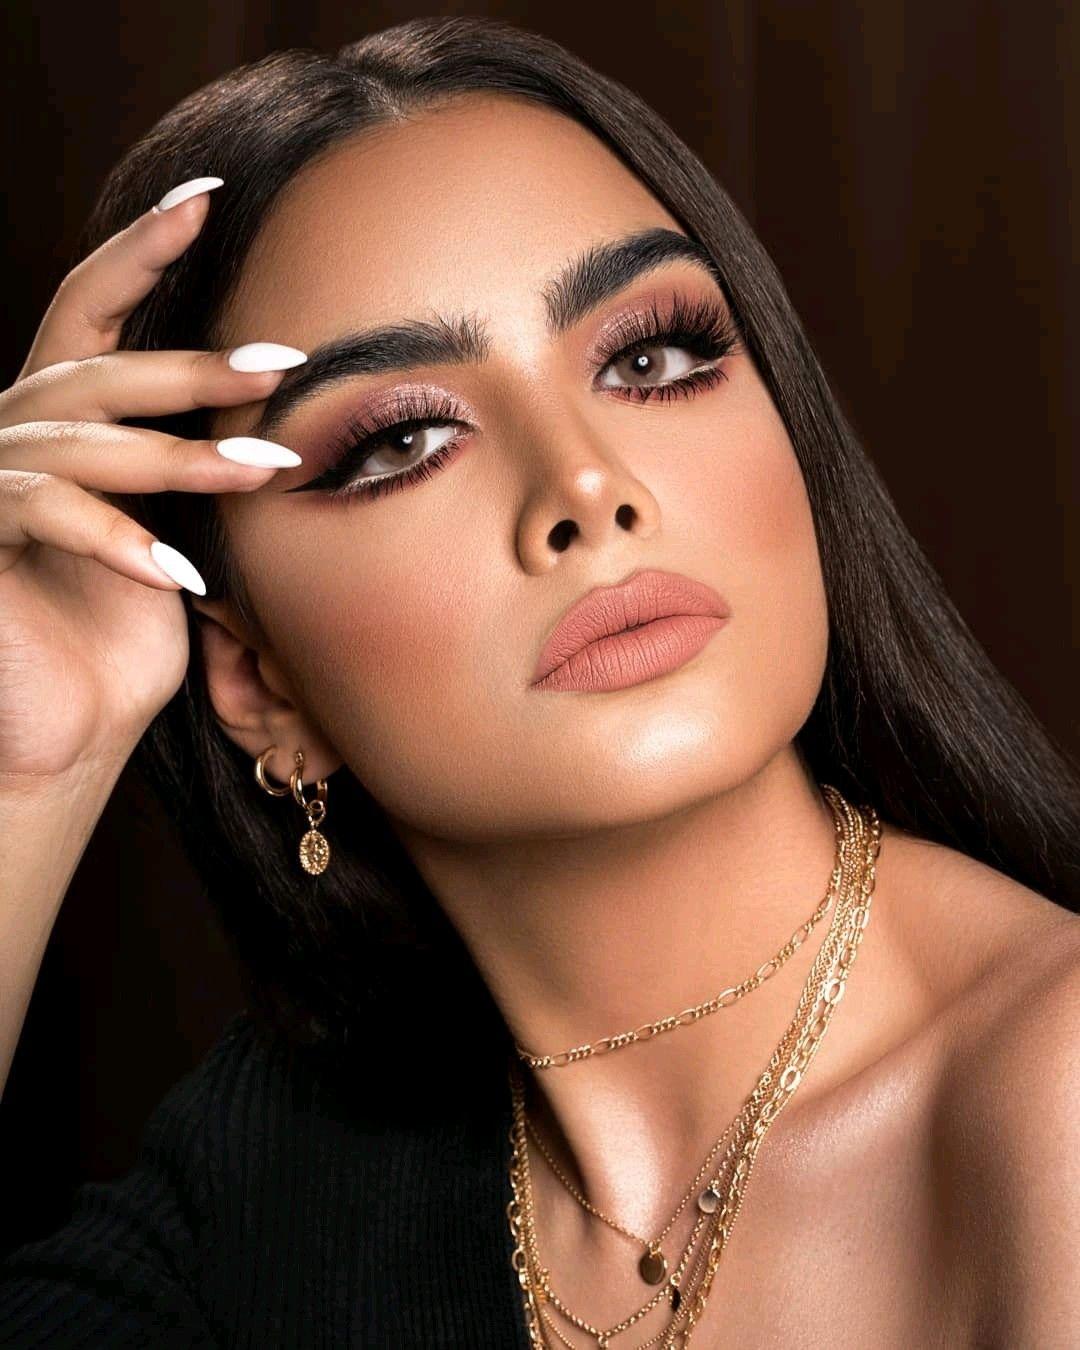 Pin by Nadine Qusto on Makeup Walgreens makeup, Makeup